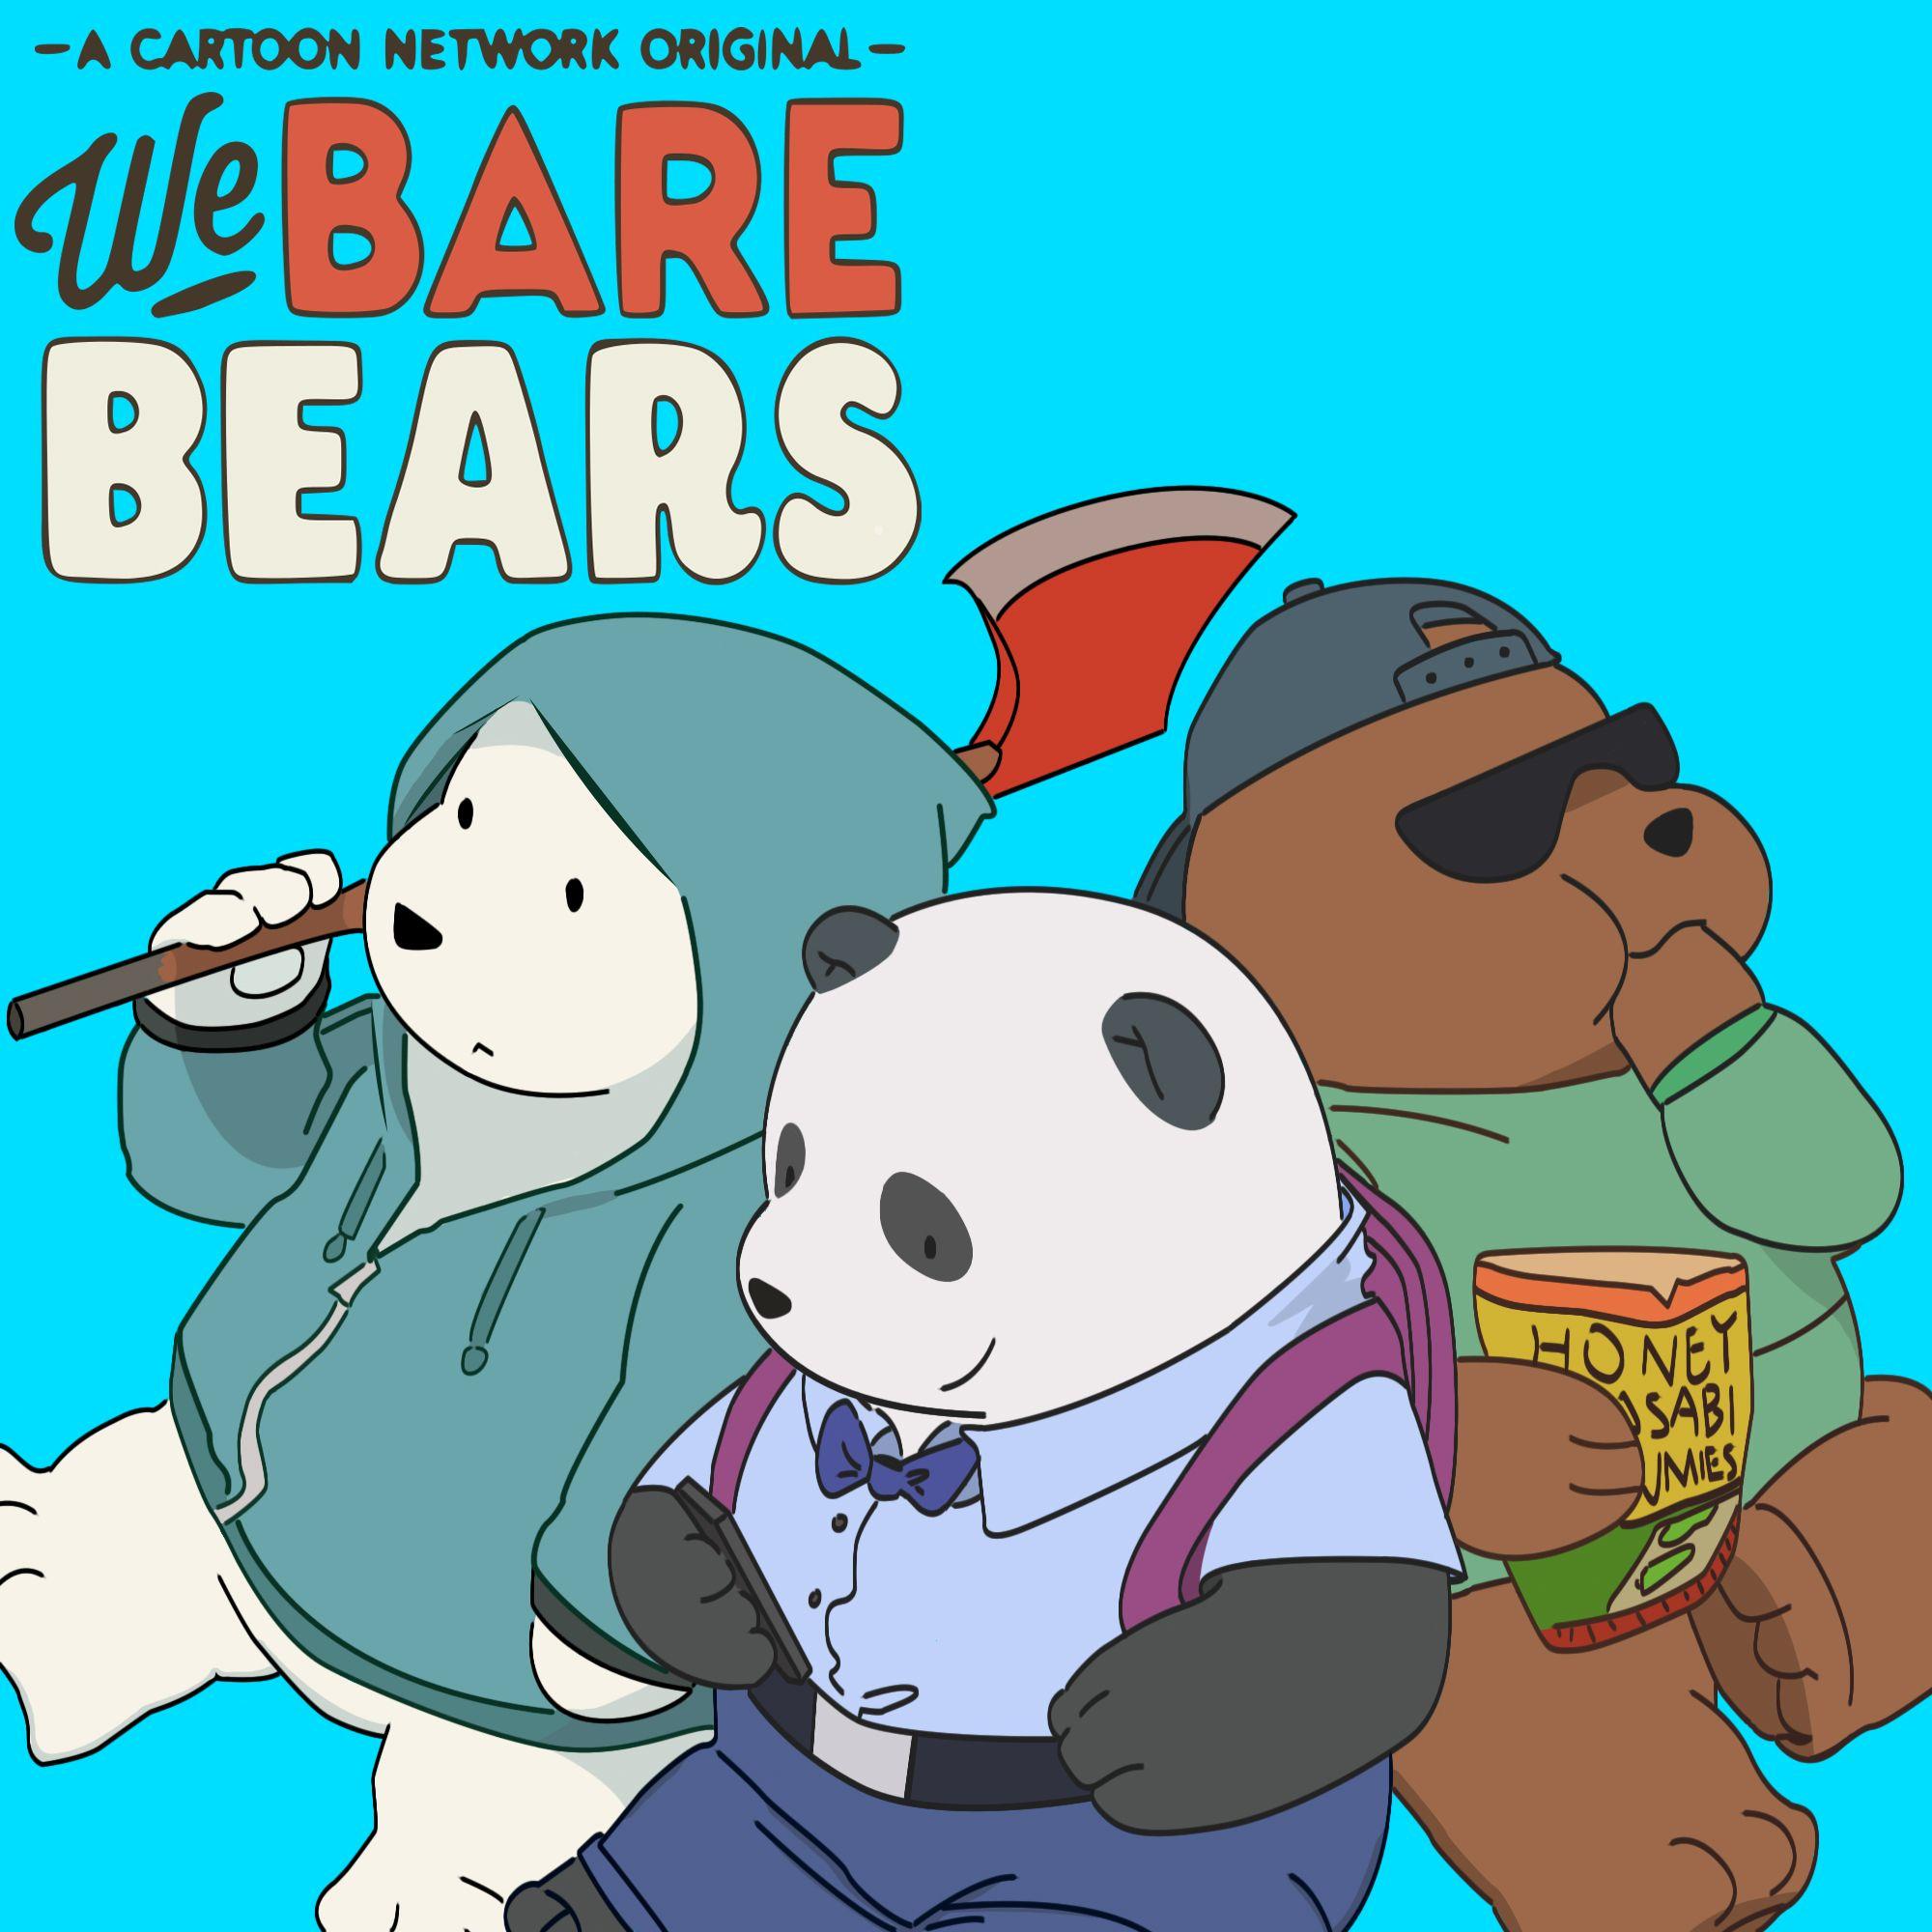 we_bare_bears_by_mikz101d98ai49.jpg (2000×2000) We bare